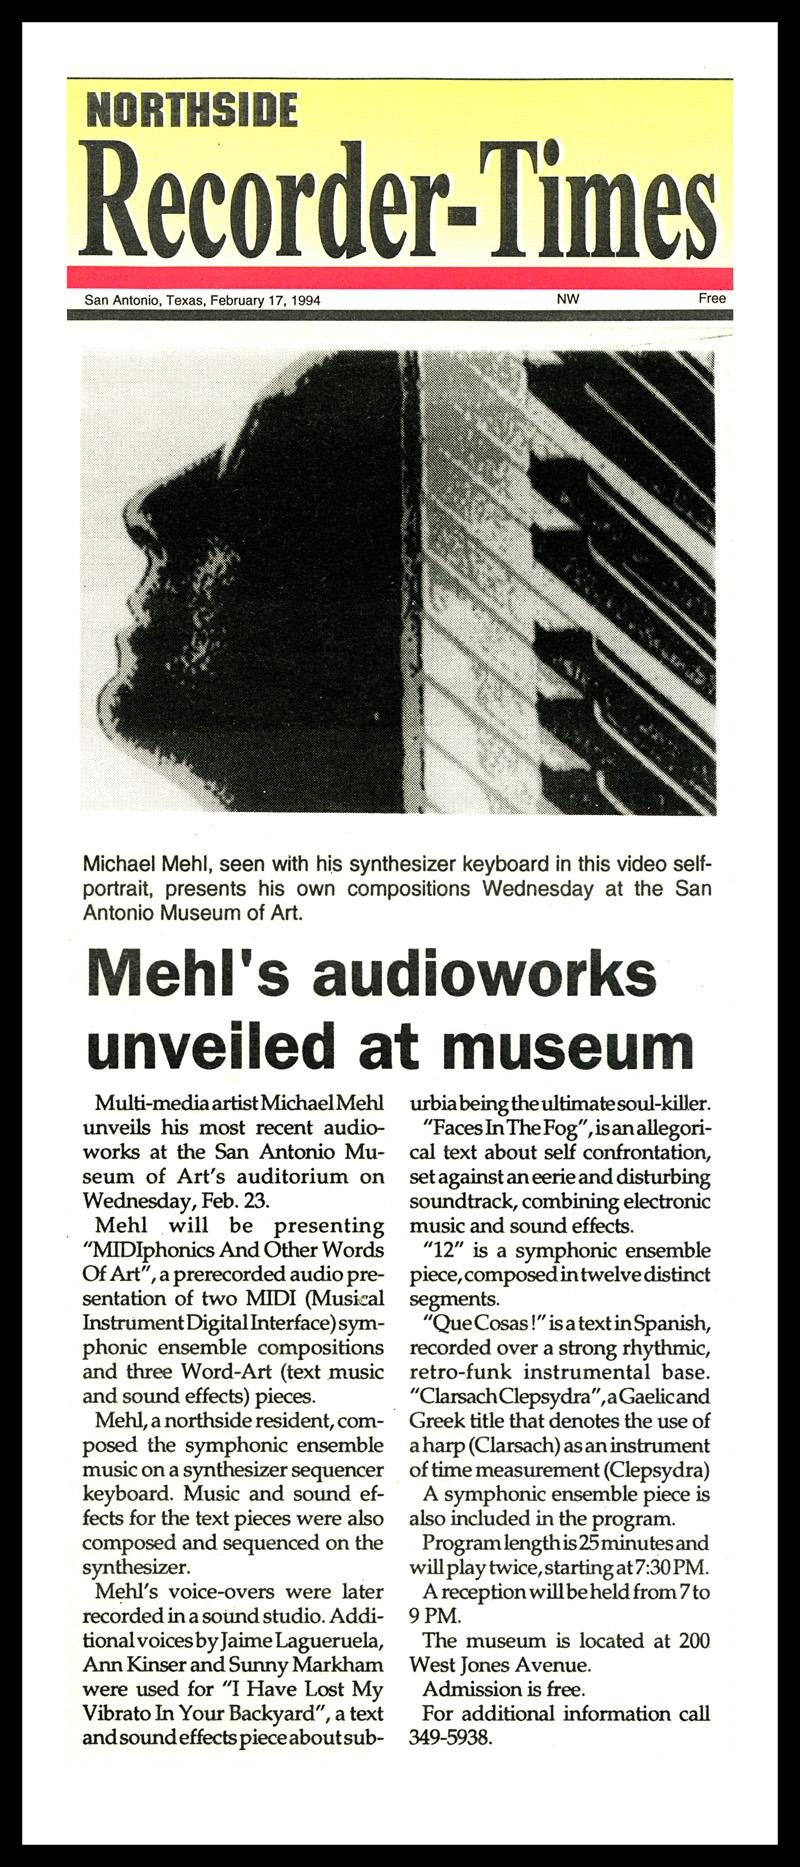 1994_Michael-Mehl_Northside-Recorder-Times-Midiphonics-Presentation_San-Antonio-Museum-Of-Art